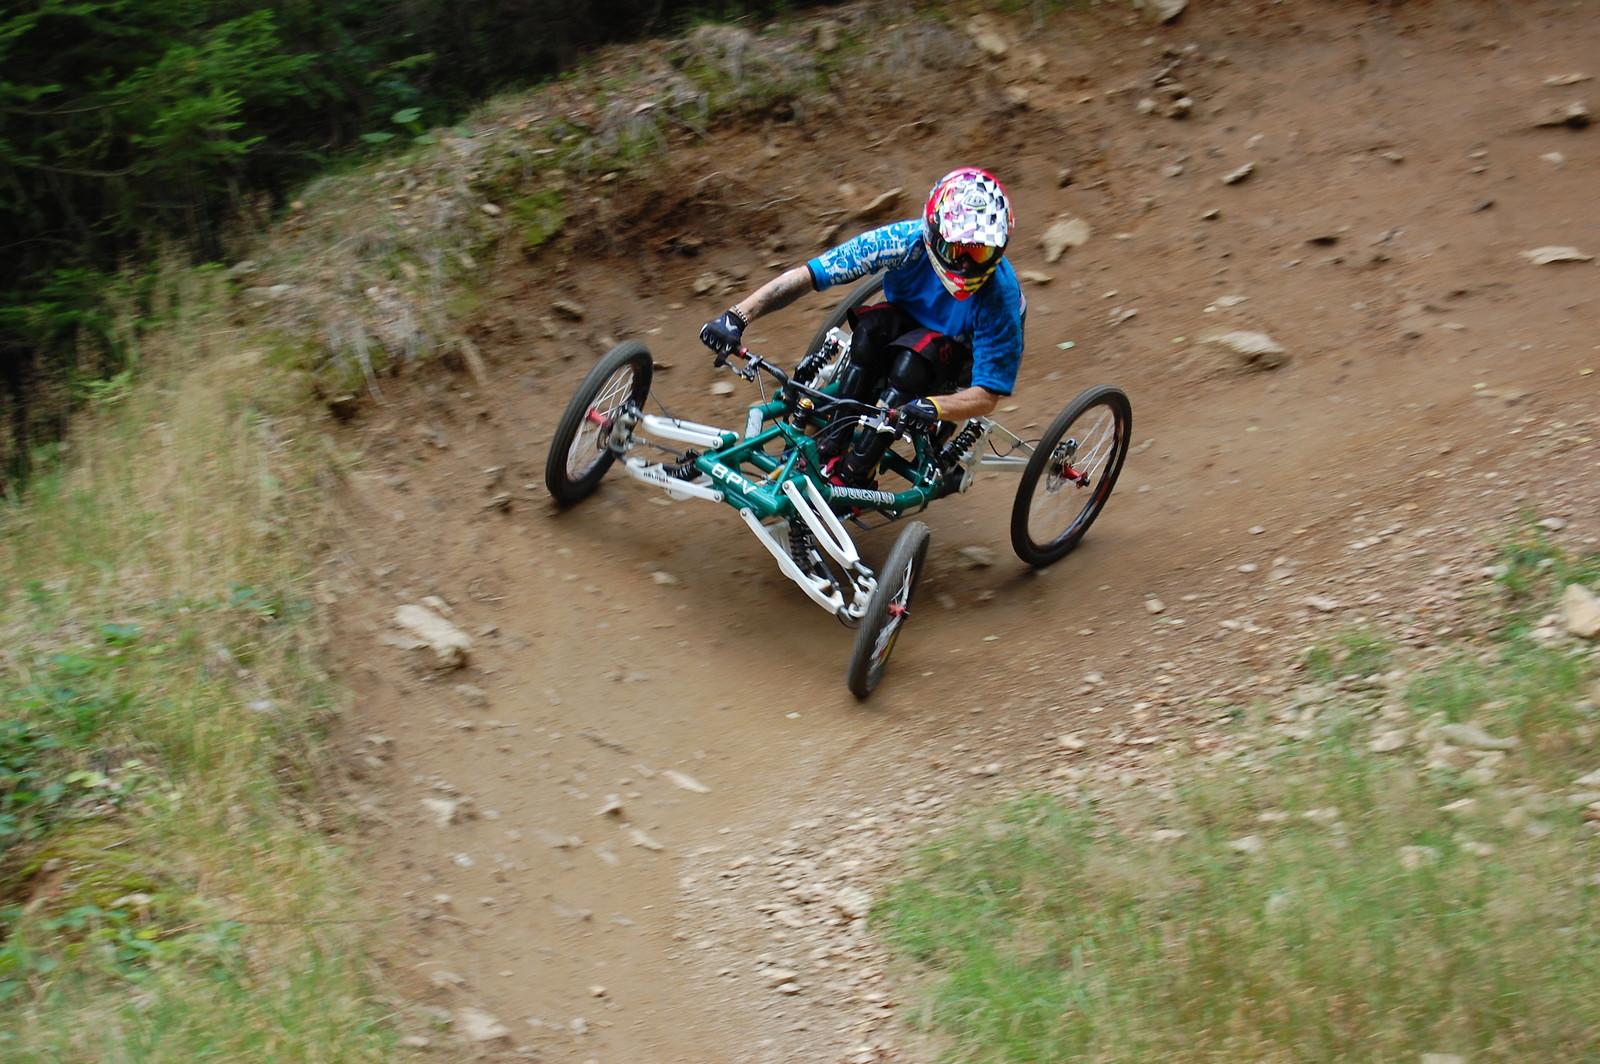 DSC 0077 - wozikmajkl83 - Mountain Biking Pictures - Vital MTB